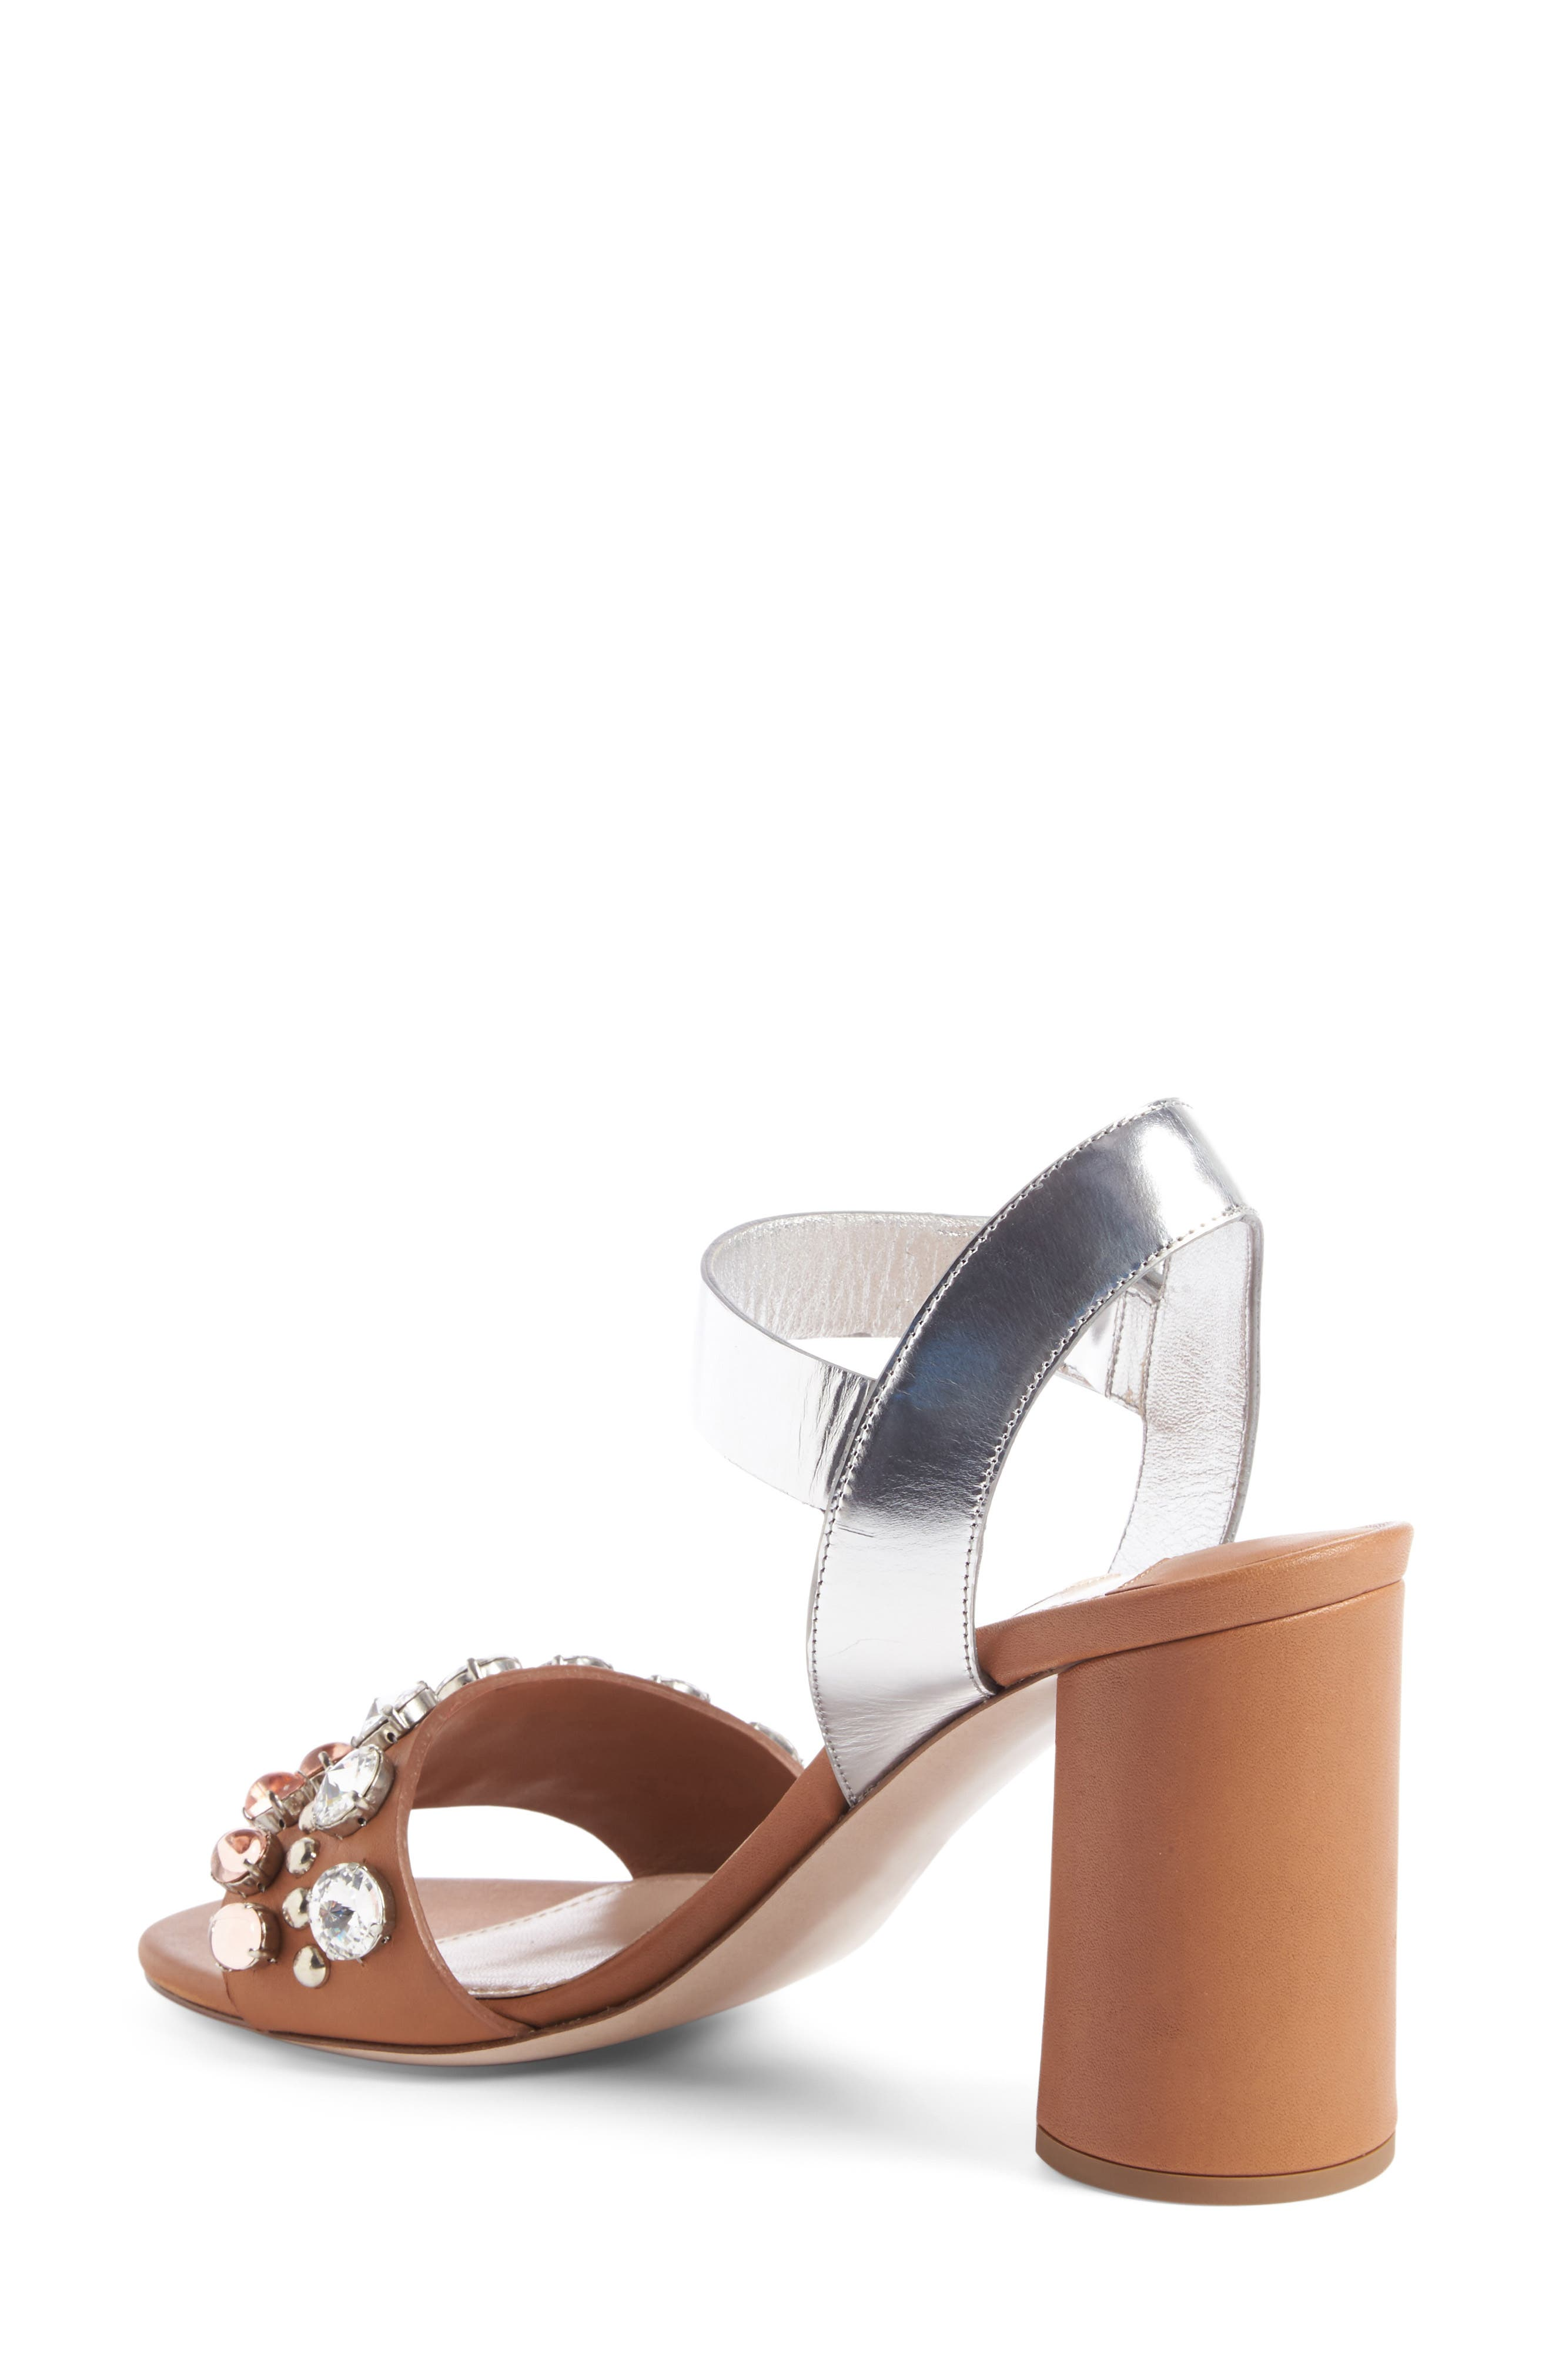 MIU MIU Jewel Sandal, Main, color, 200